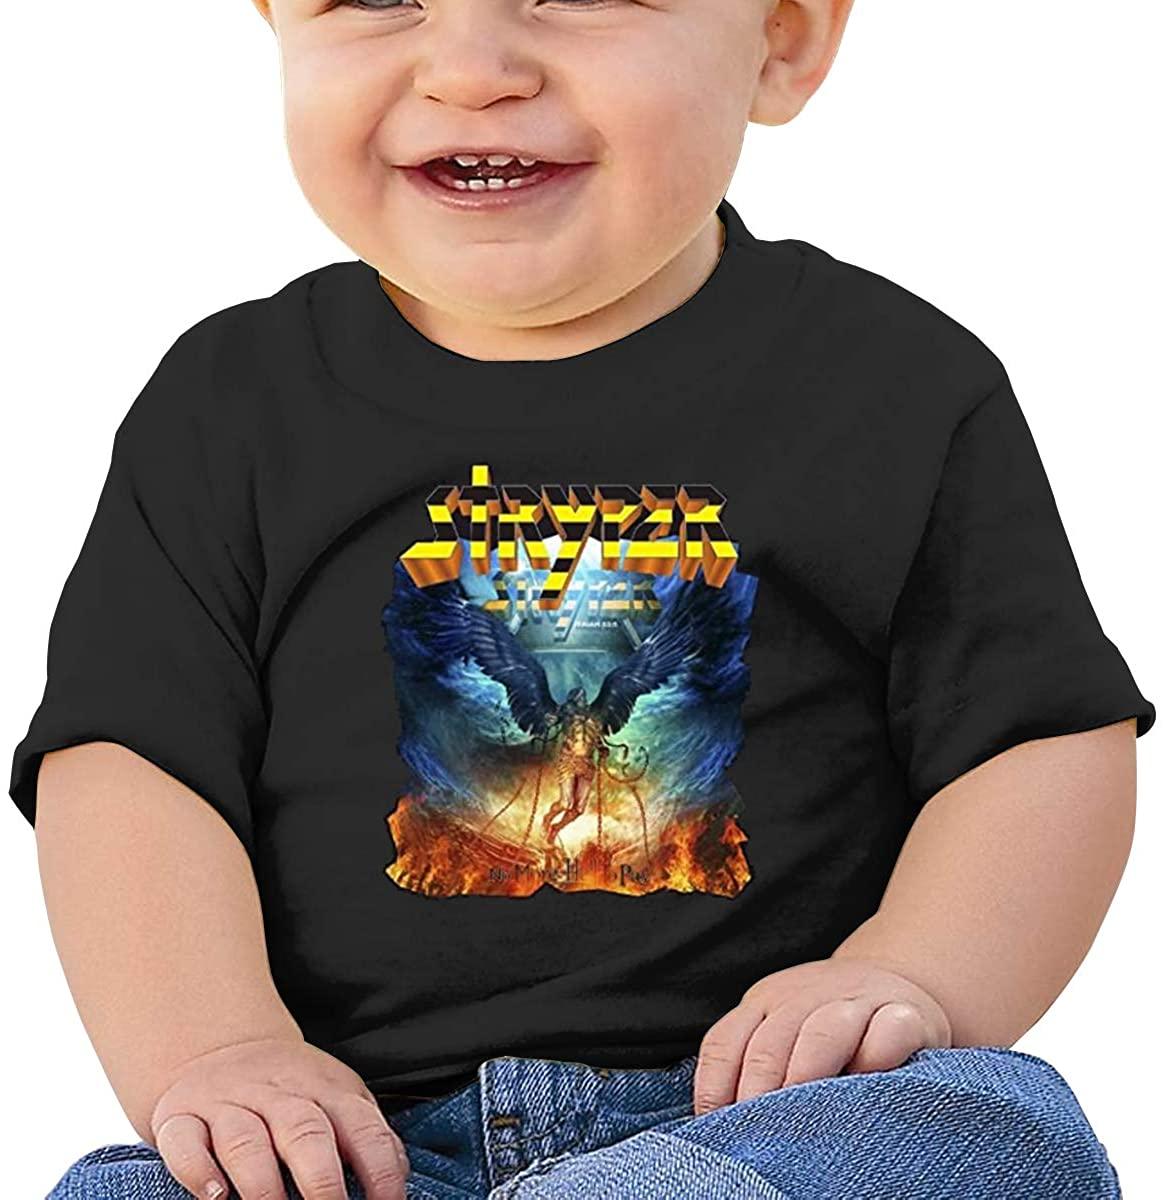 6-24 Months Boy and Girl Baby Short Sleeve T-Shirt Stryper Elegant and Simple Design Black